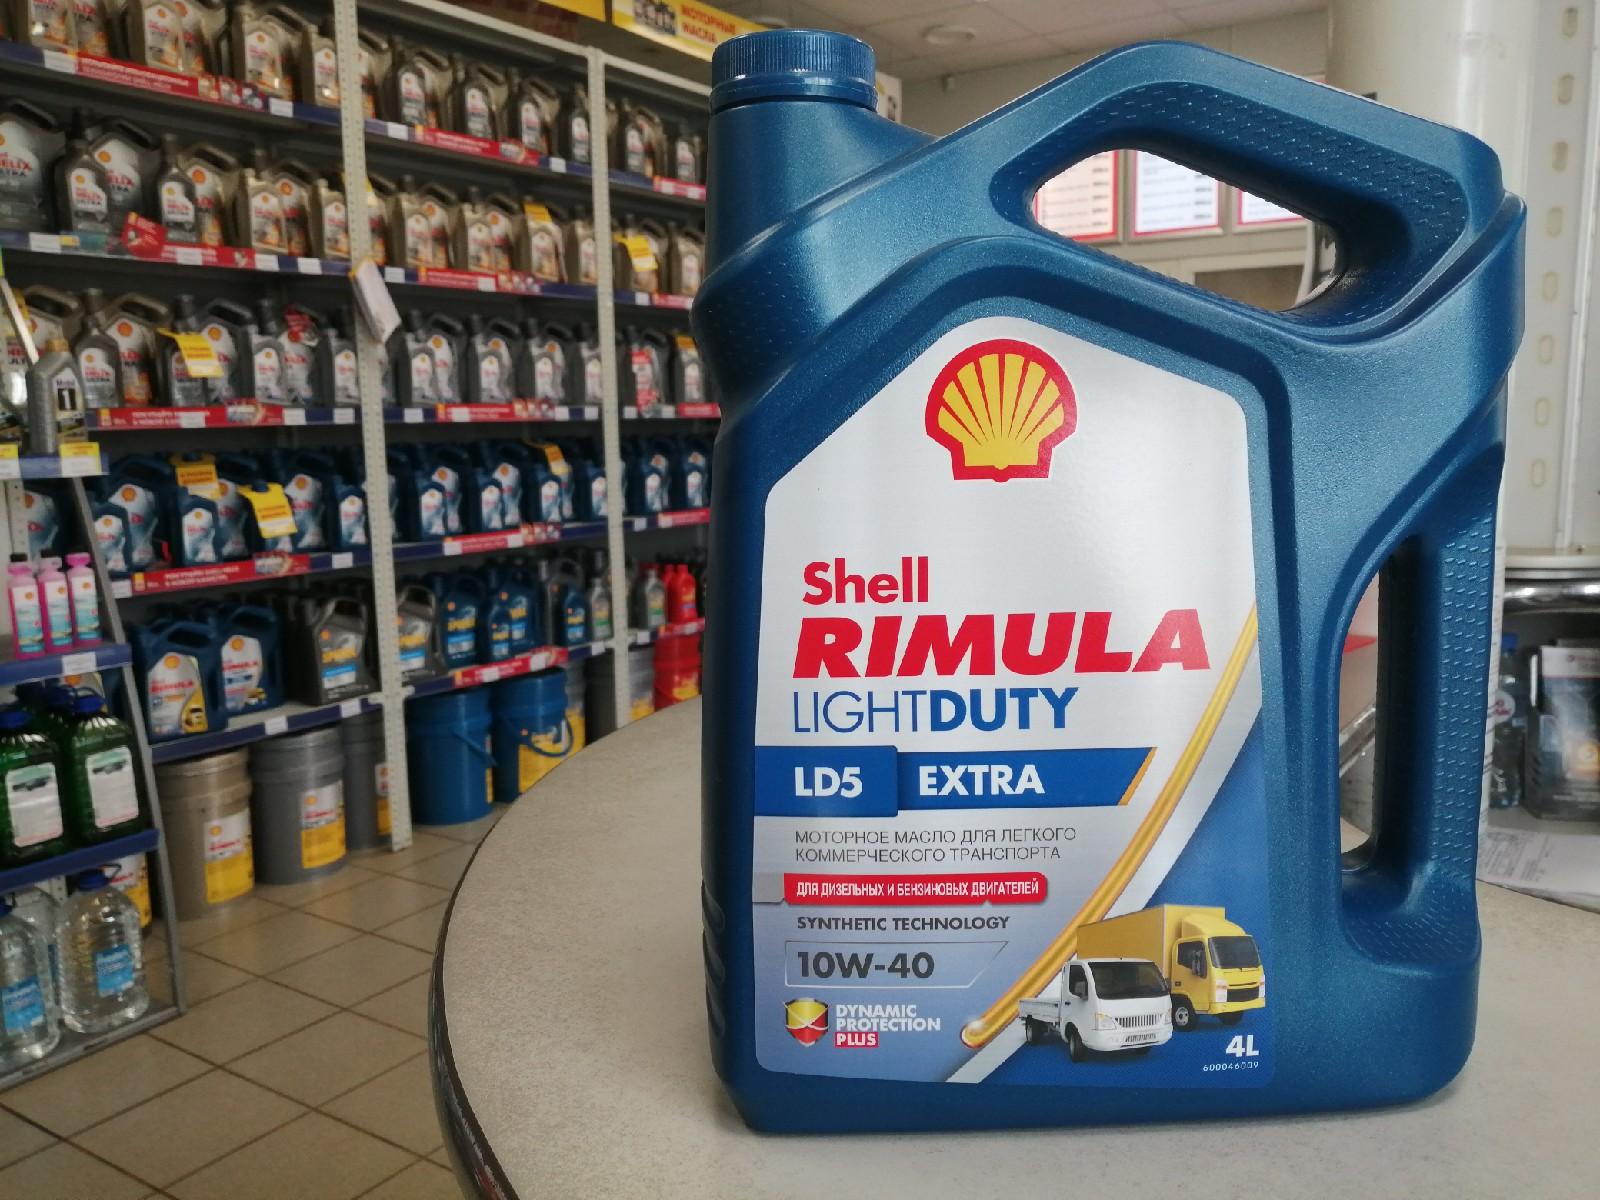 Новинка от Shell для коммерческого транспорта